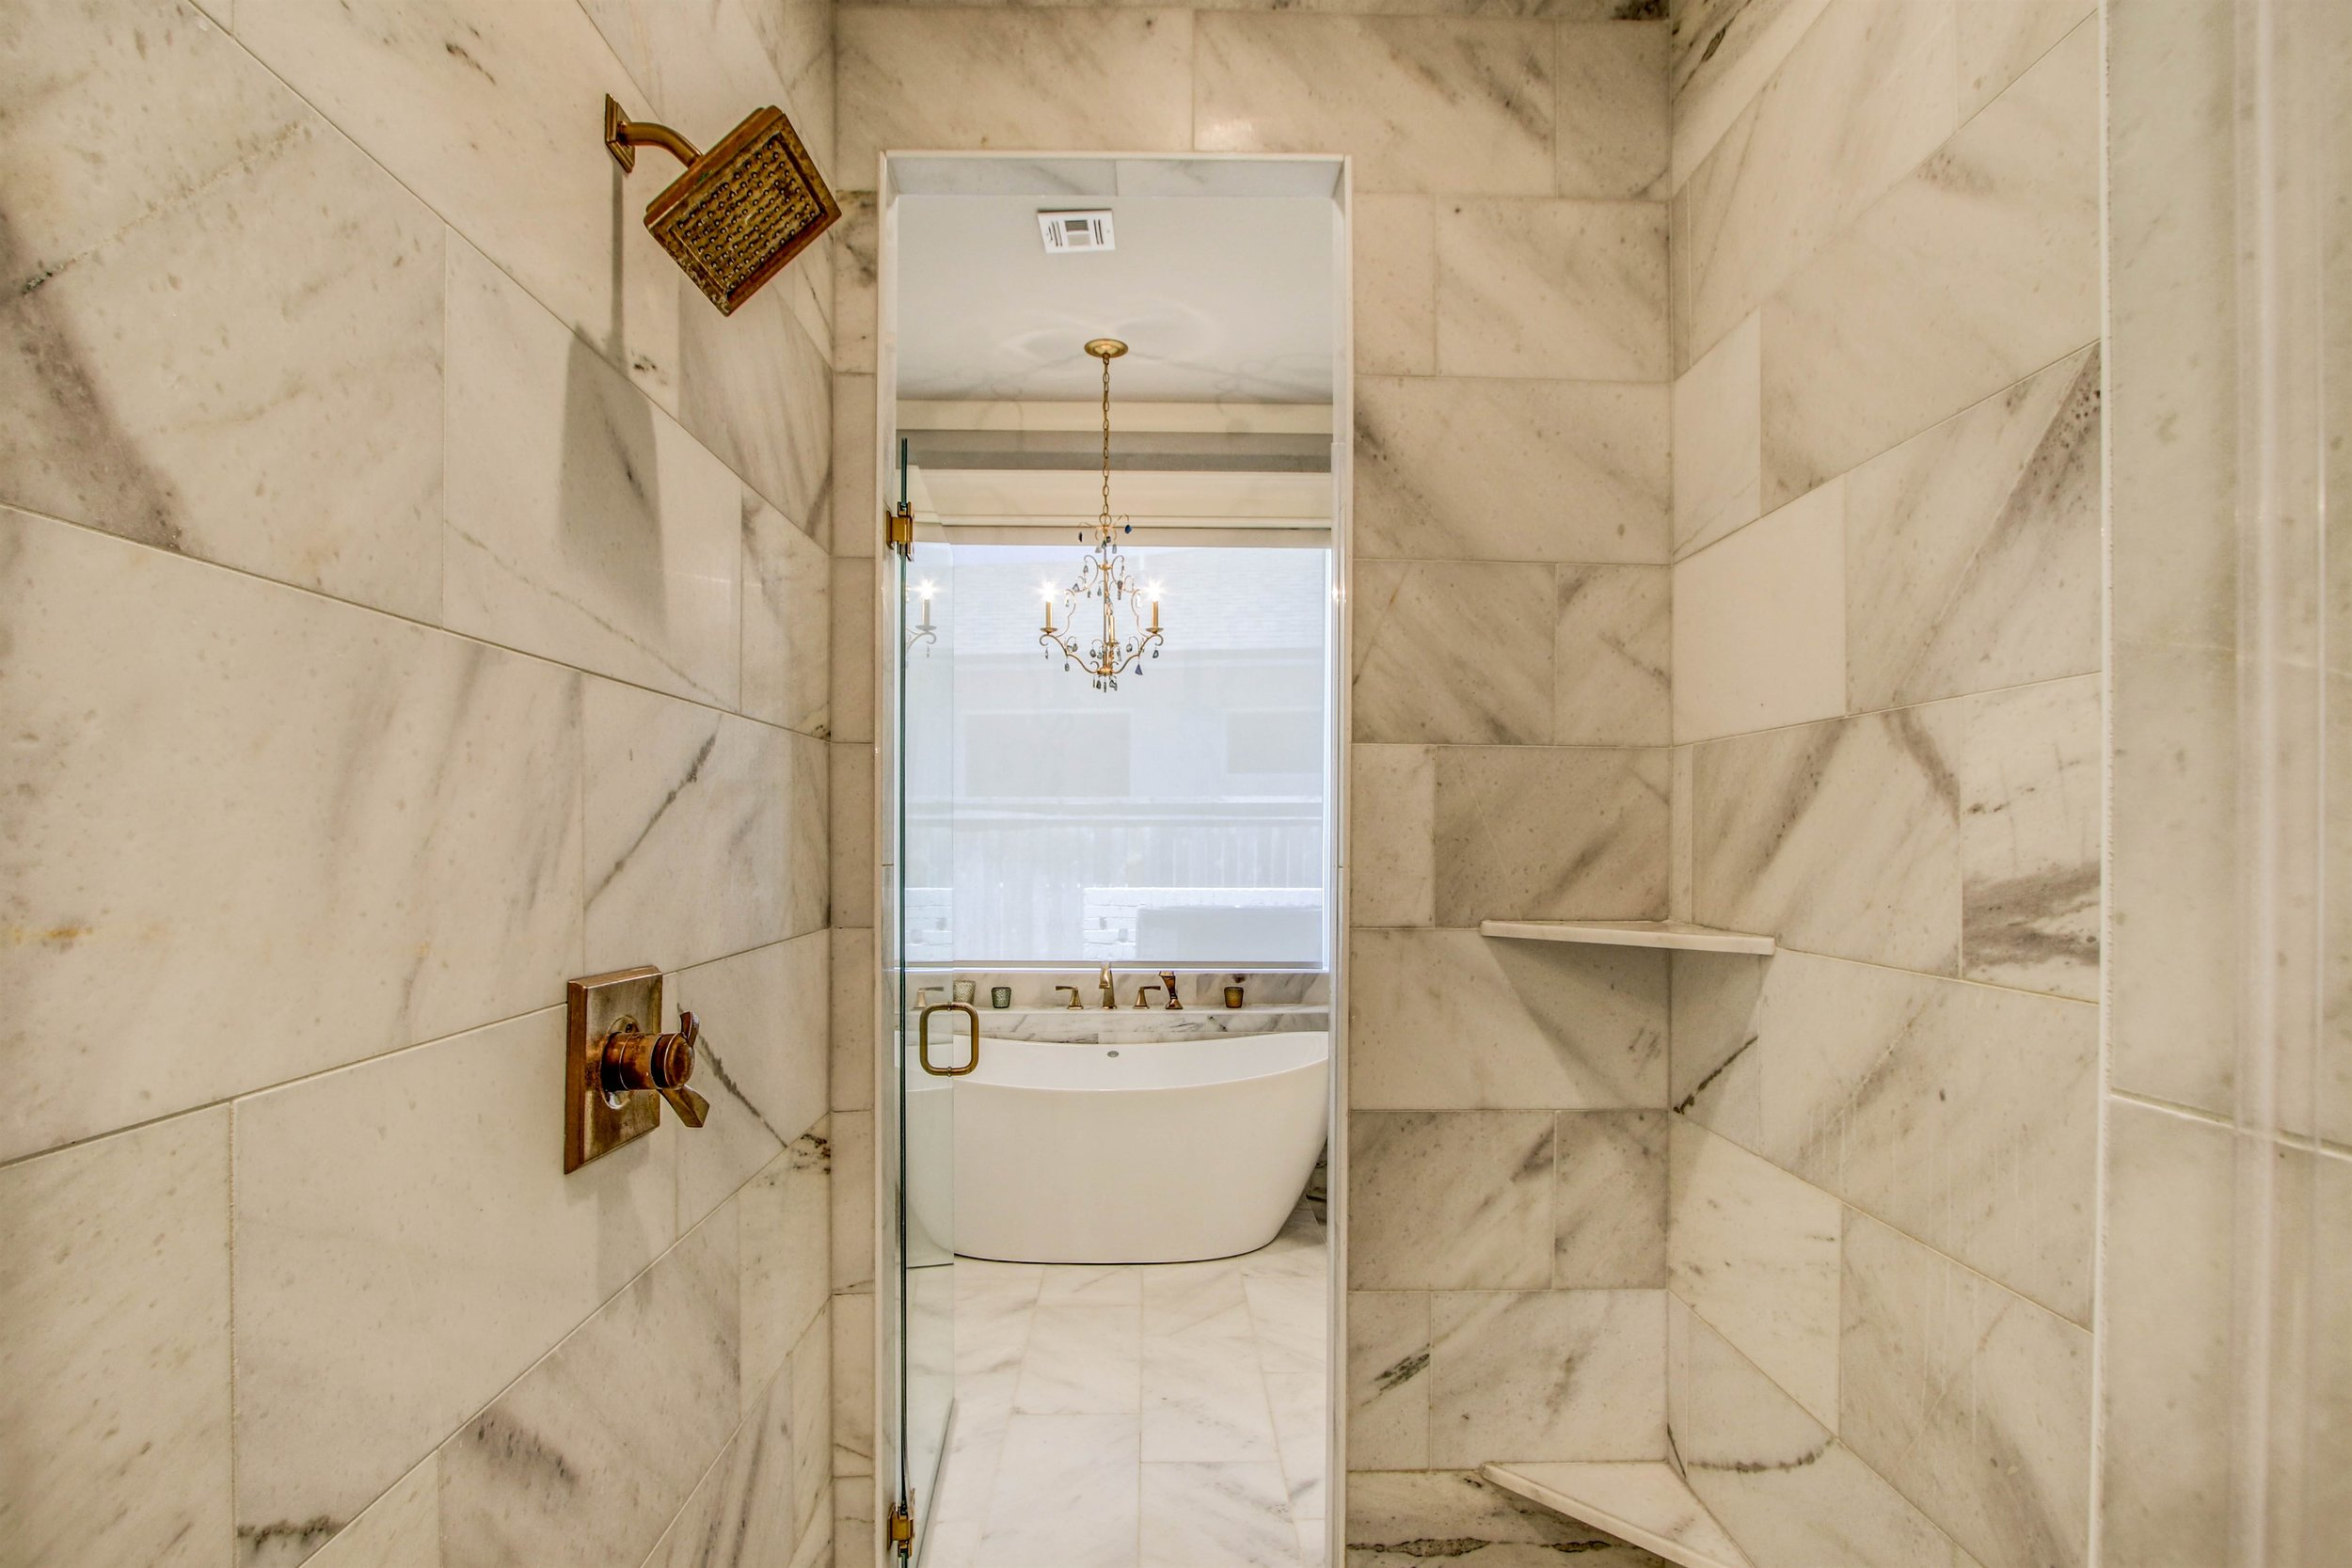 015_Master Bathroom Shower and Tub.jpg